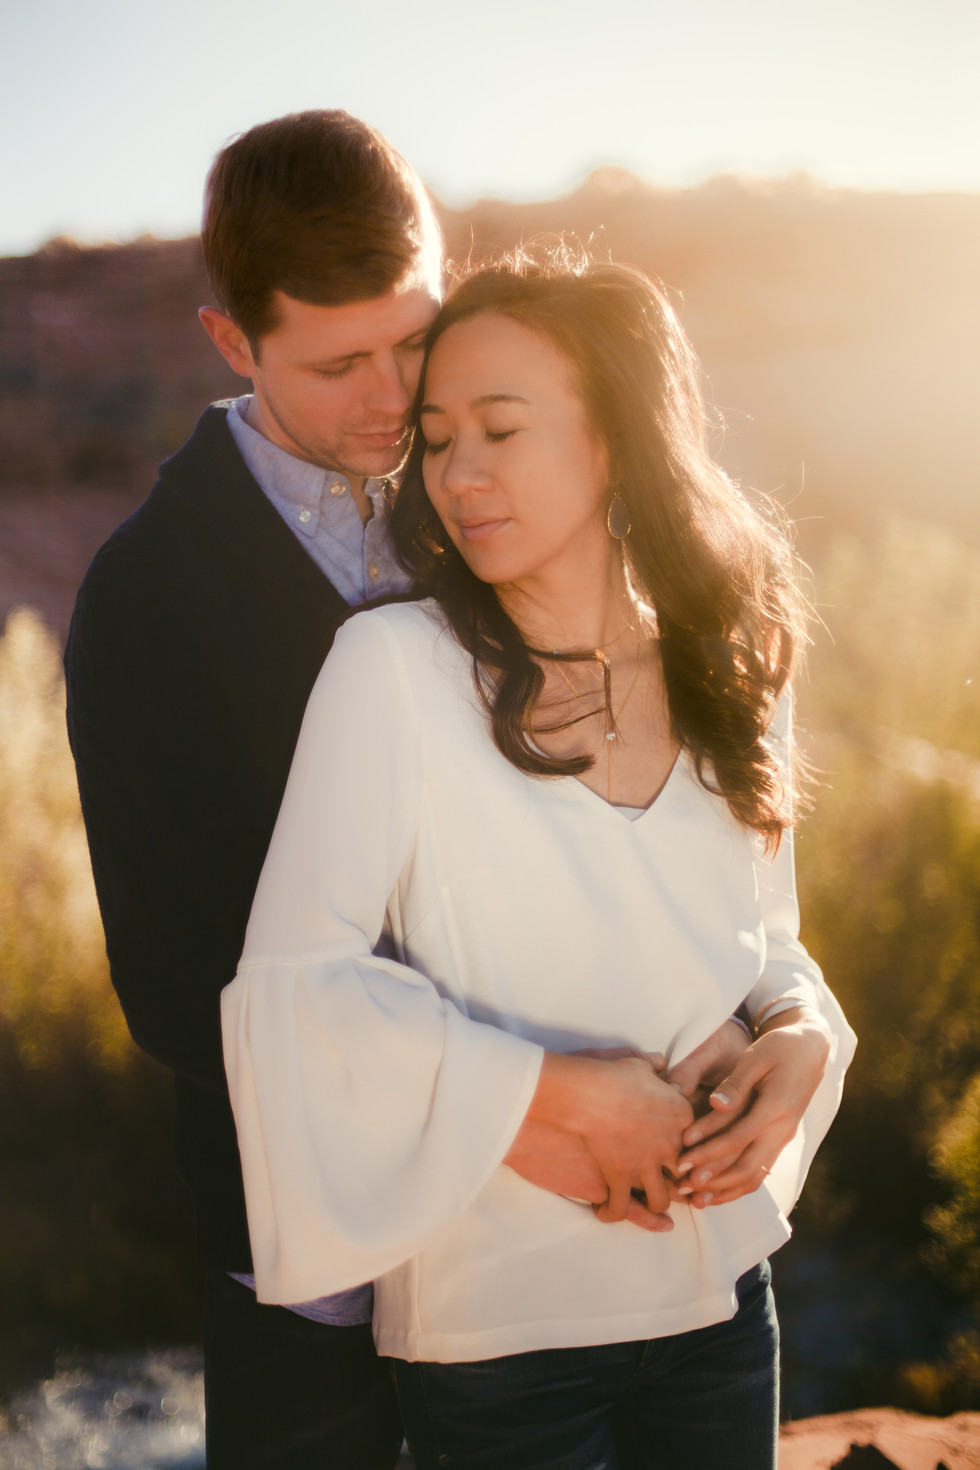 Matt & Tanya, Sand Hollow